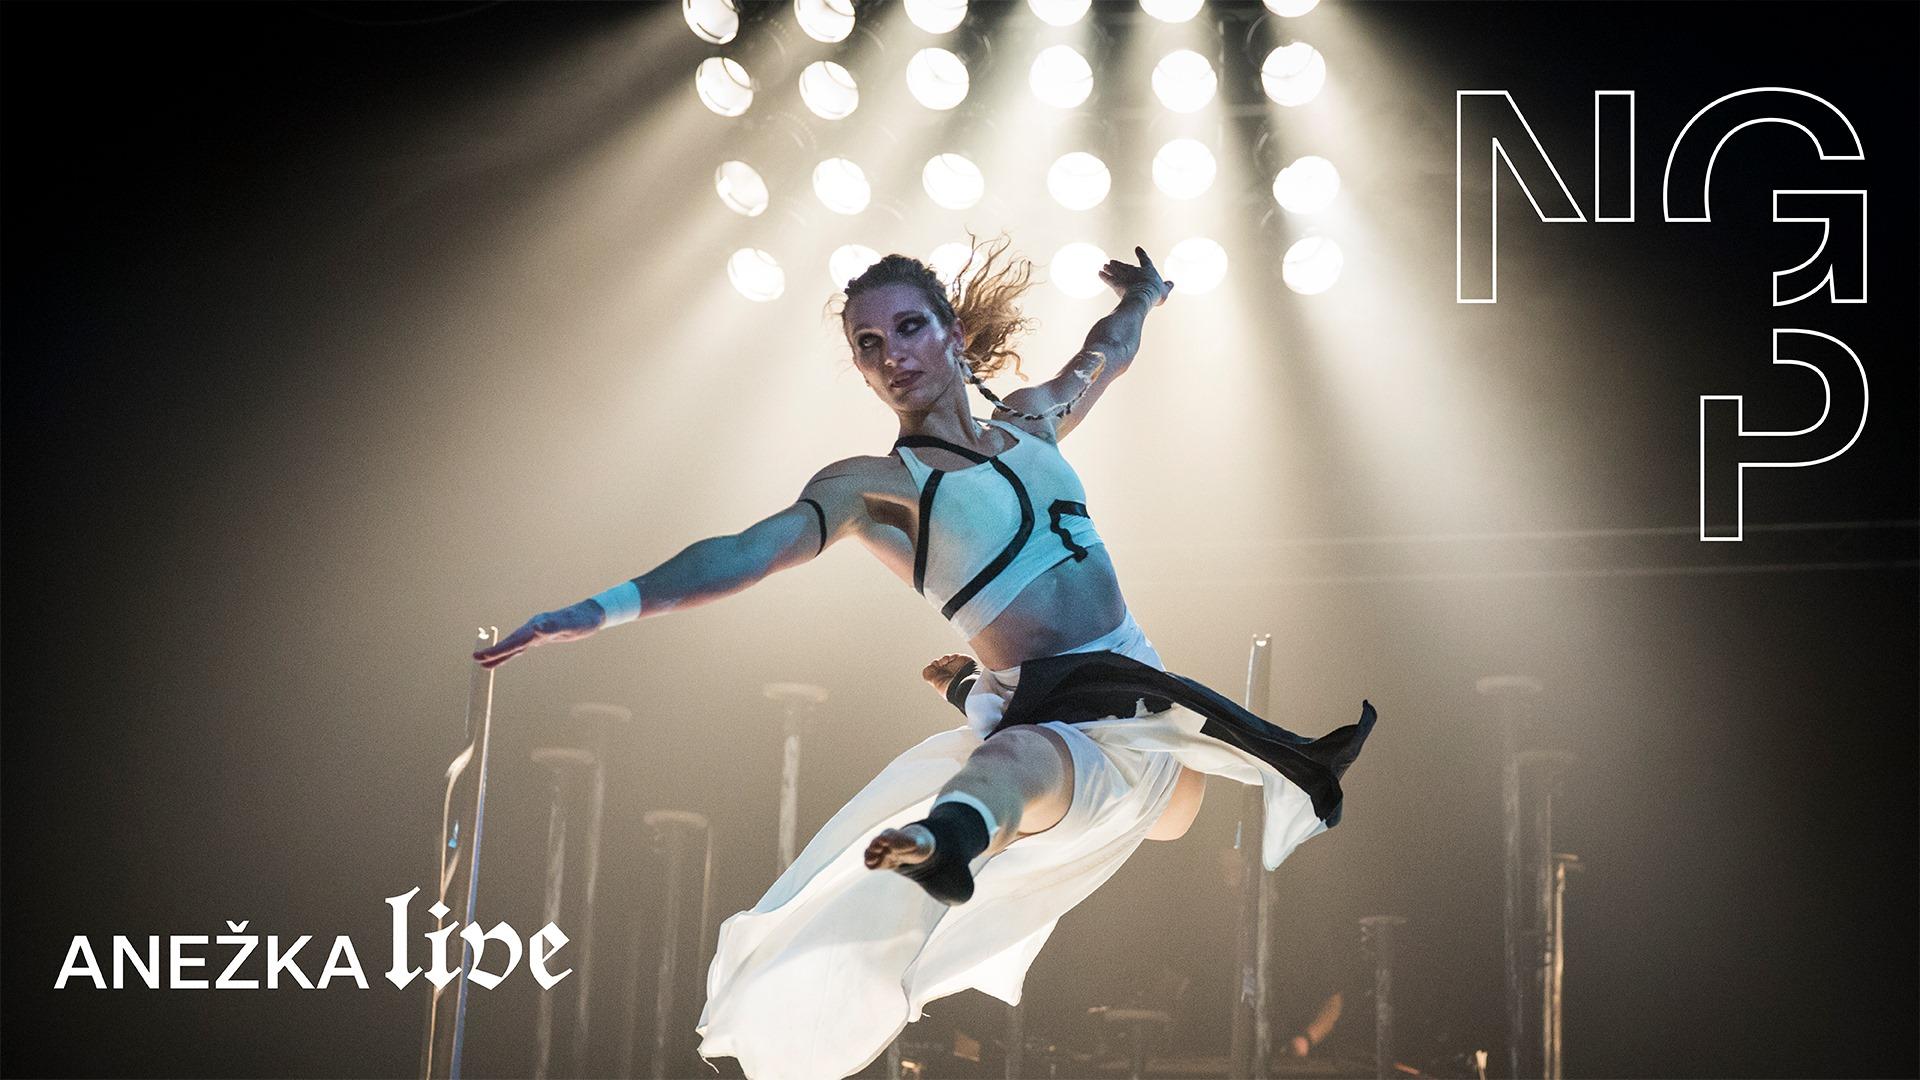 Anežka LIVE: Vzduchem - Losers Cirque Company